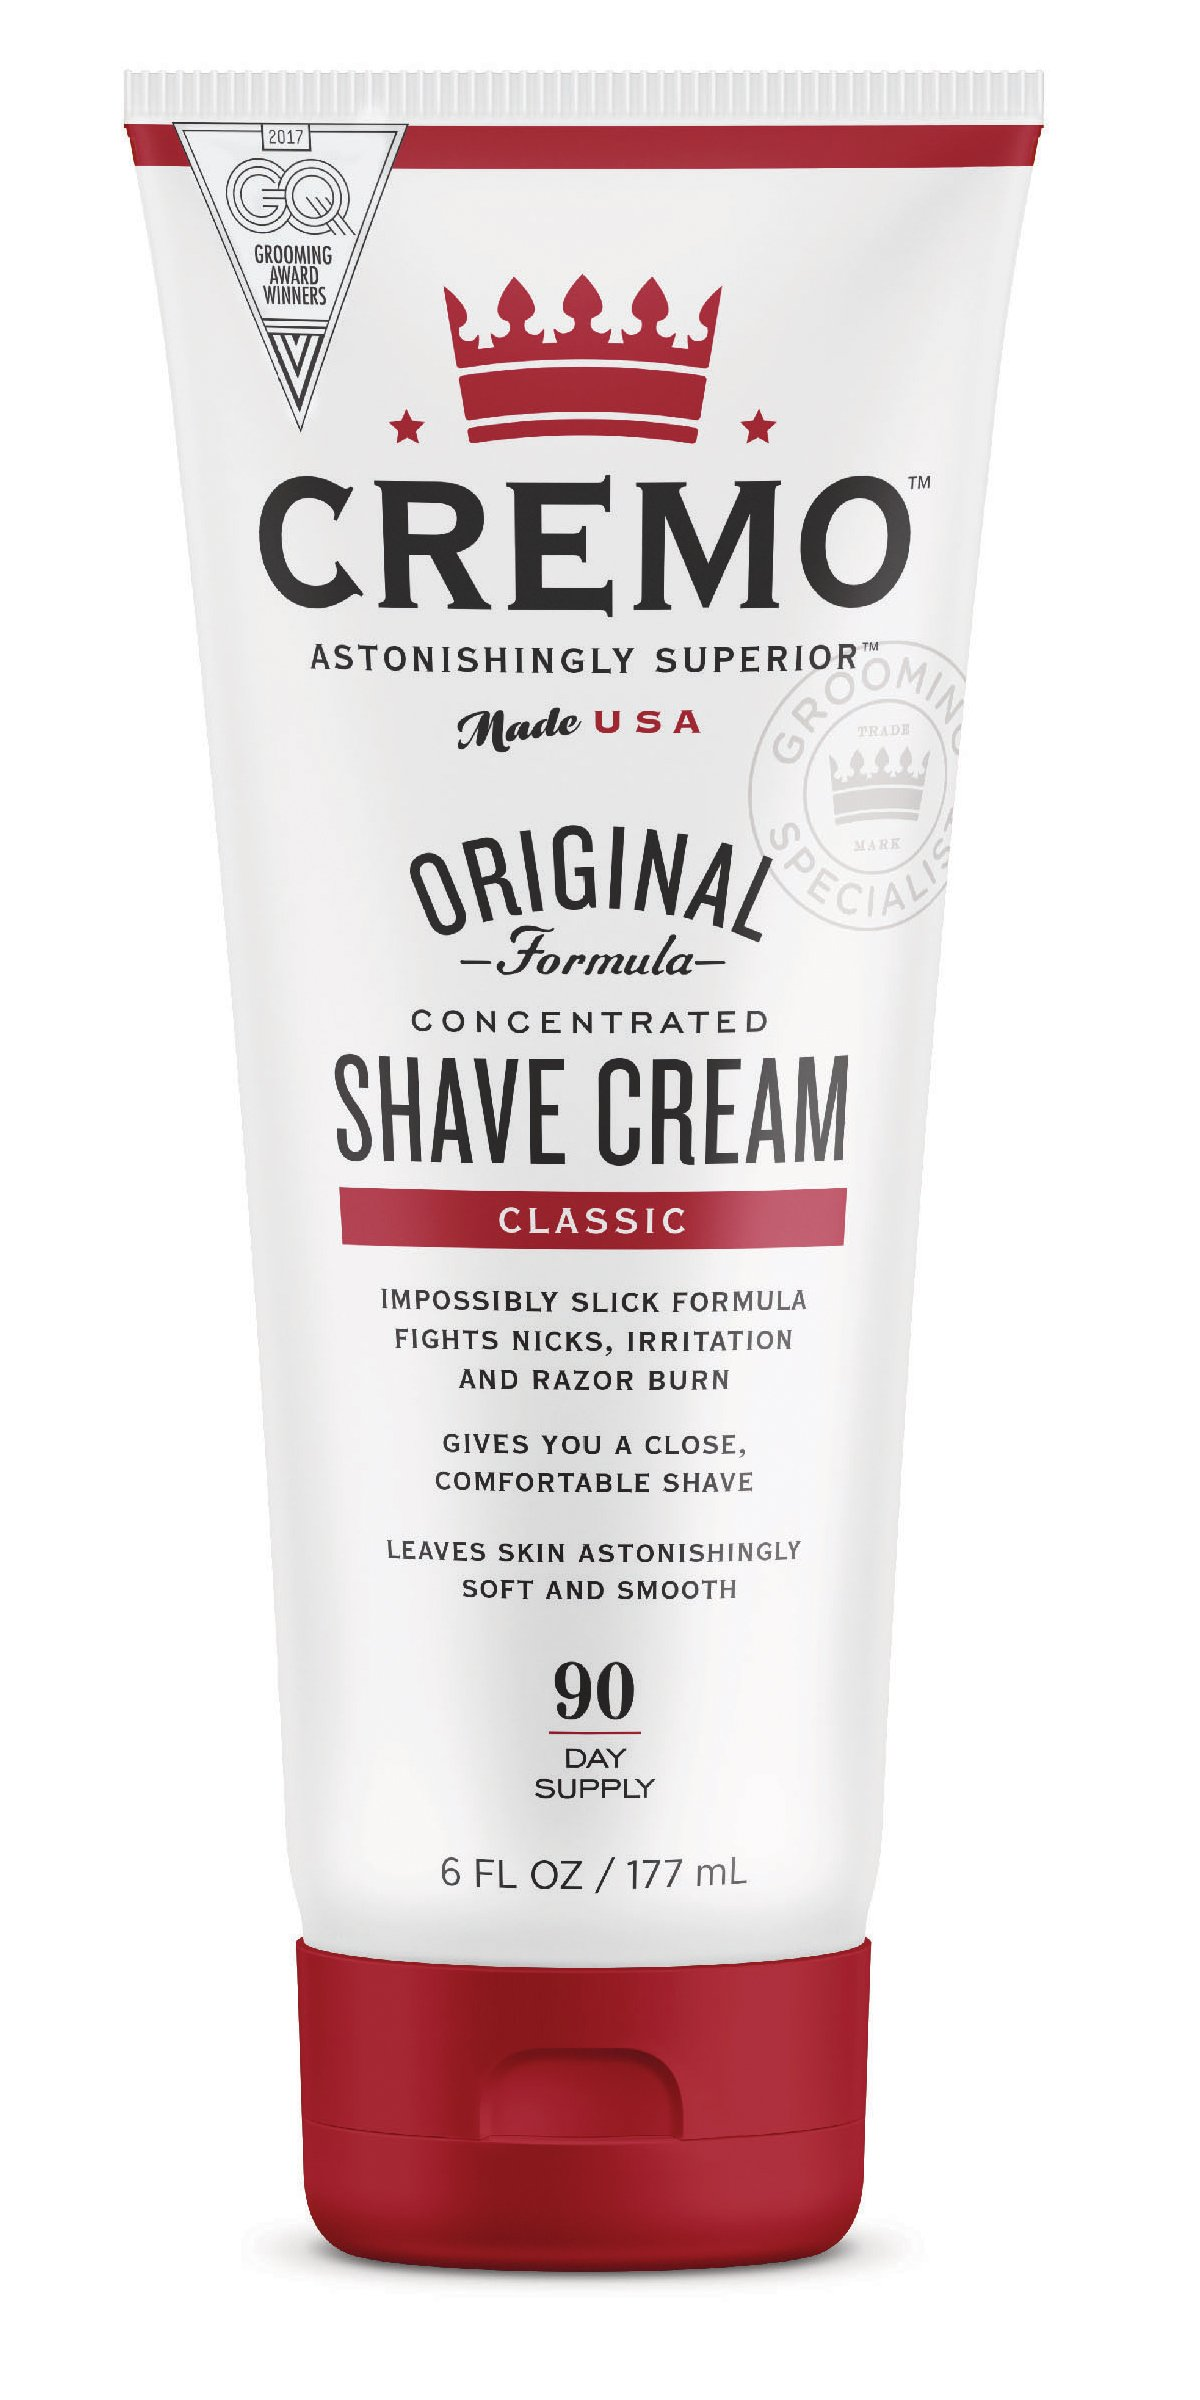 Cremo Original Shave Cream, Astonishingly Superior Smooth Shaving Cream Fights Nicks, Cuts And Razor Burn, 6 Ounces